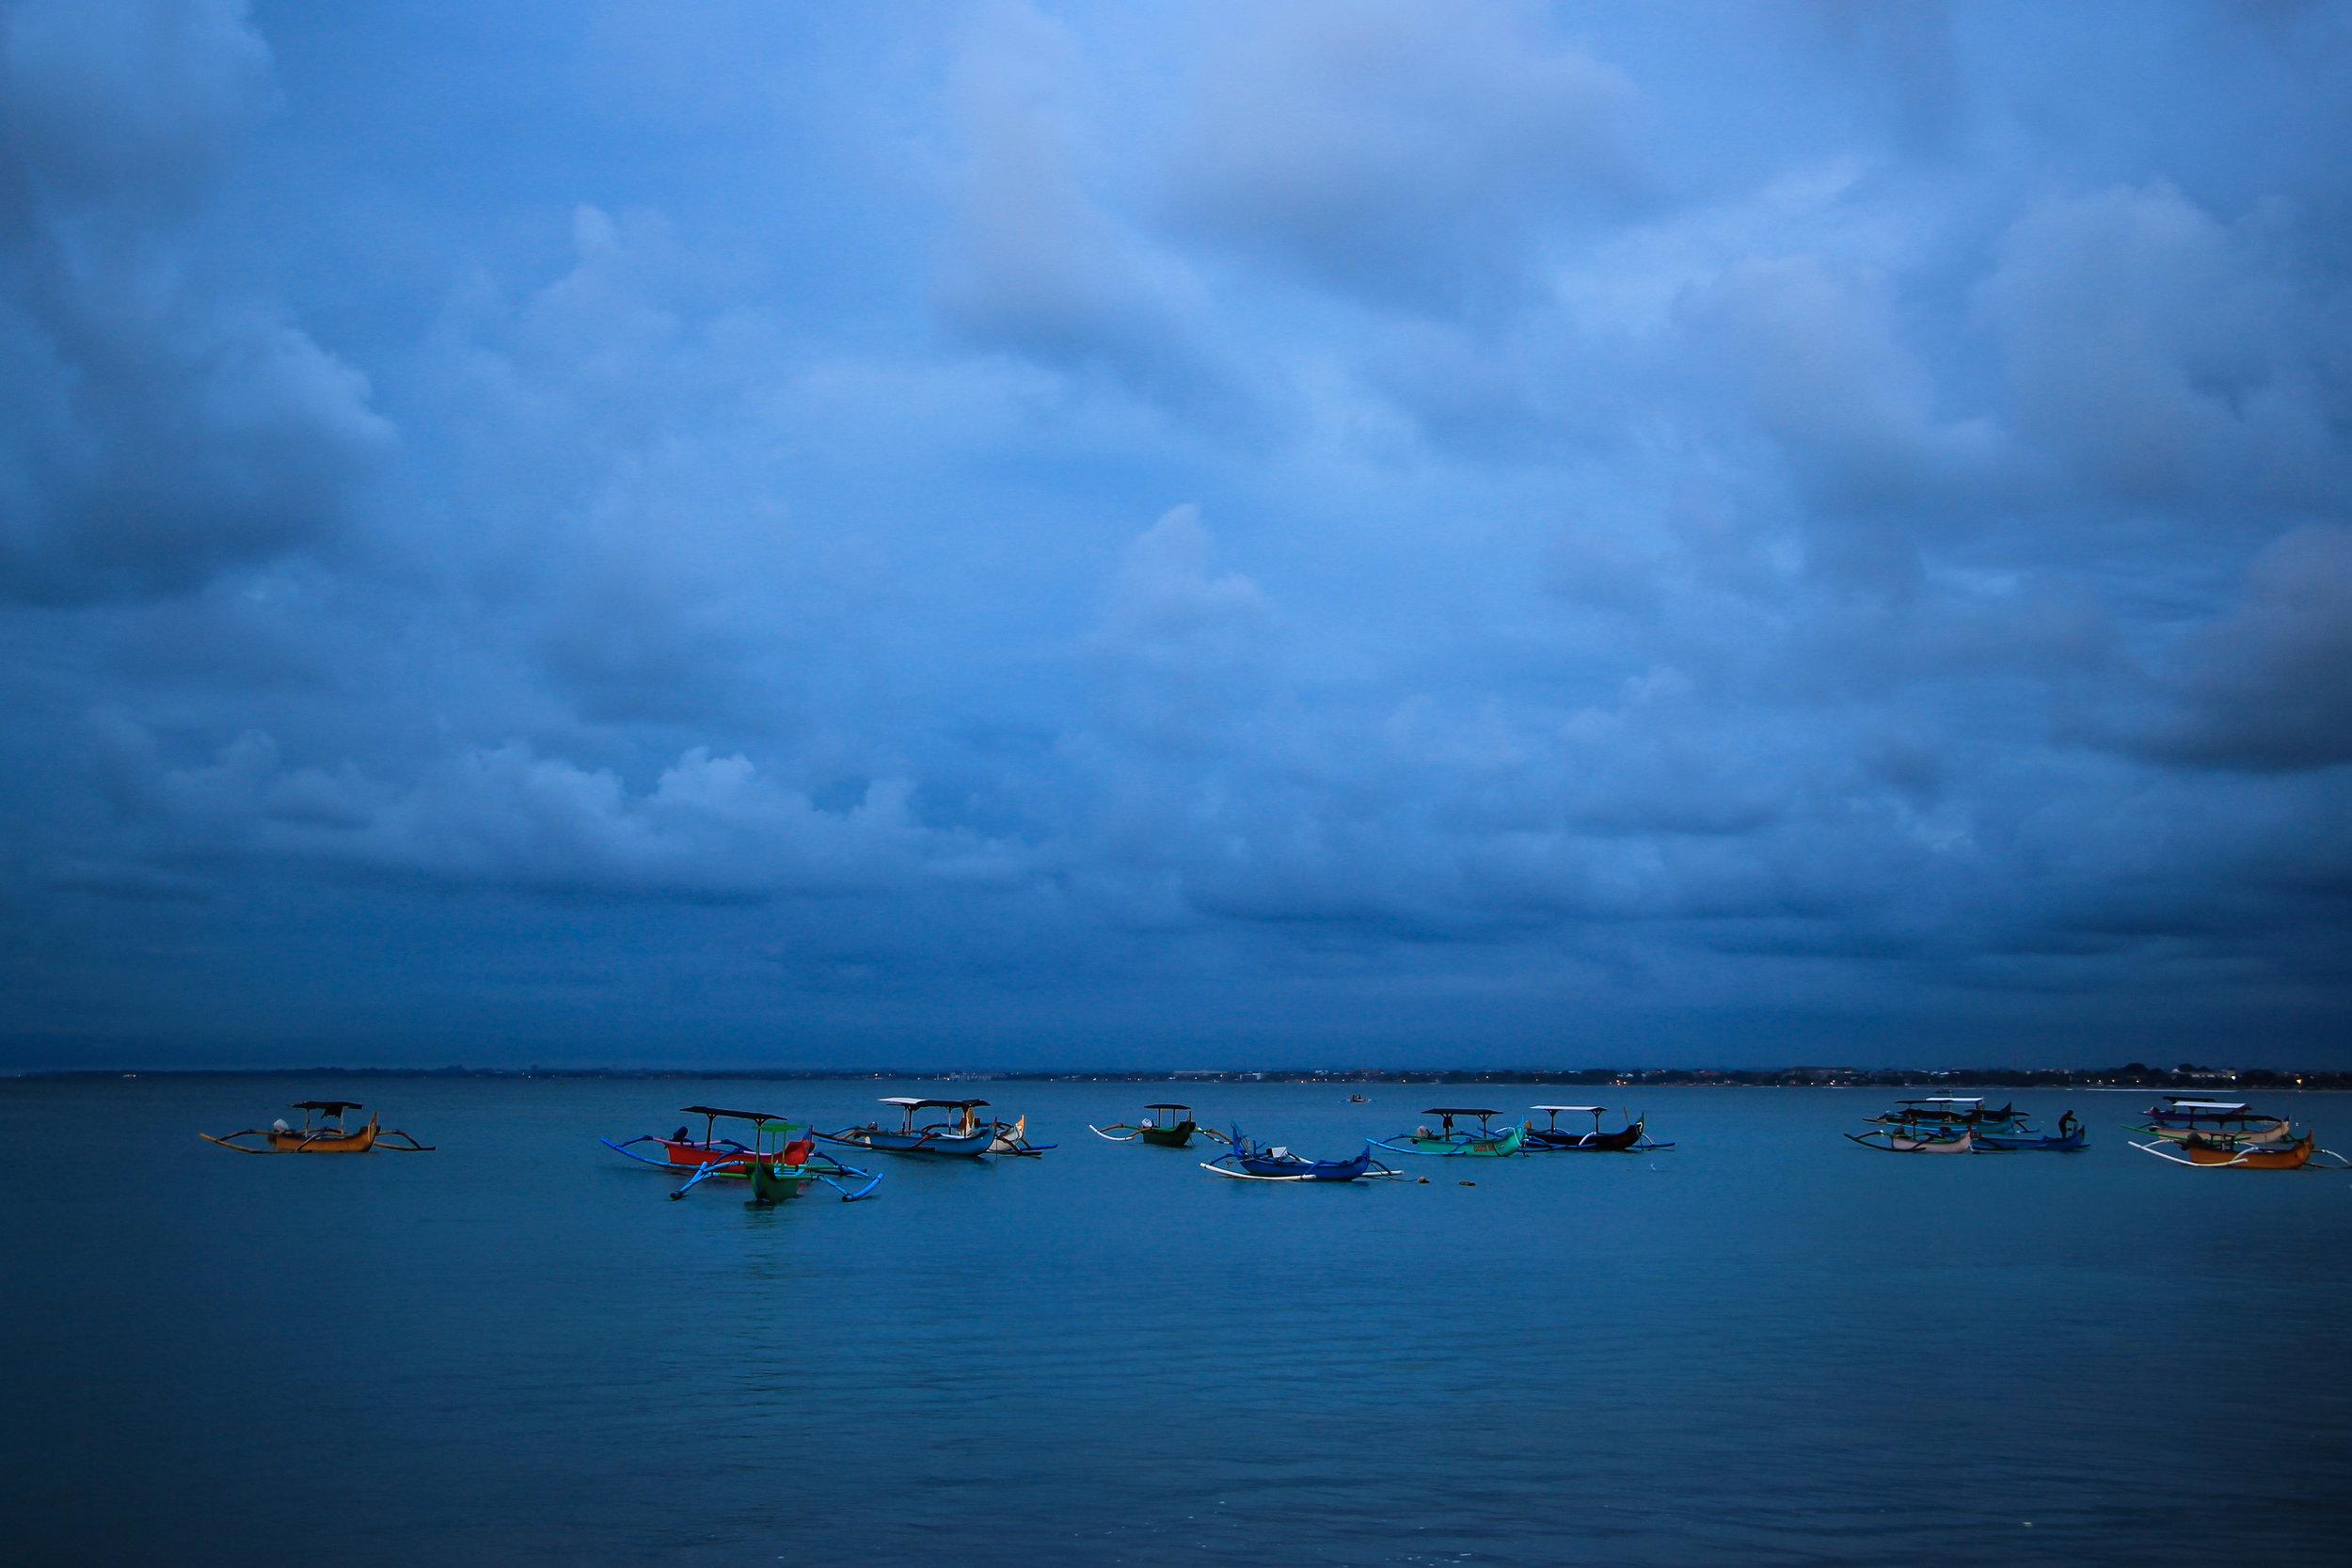 sunset, Sea, fishing boat, blue, storm, Bali, Indonesia, Asia | DoLessGetMoreDone.com |